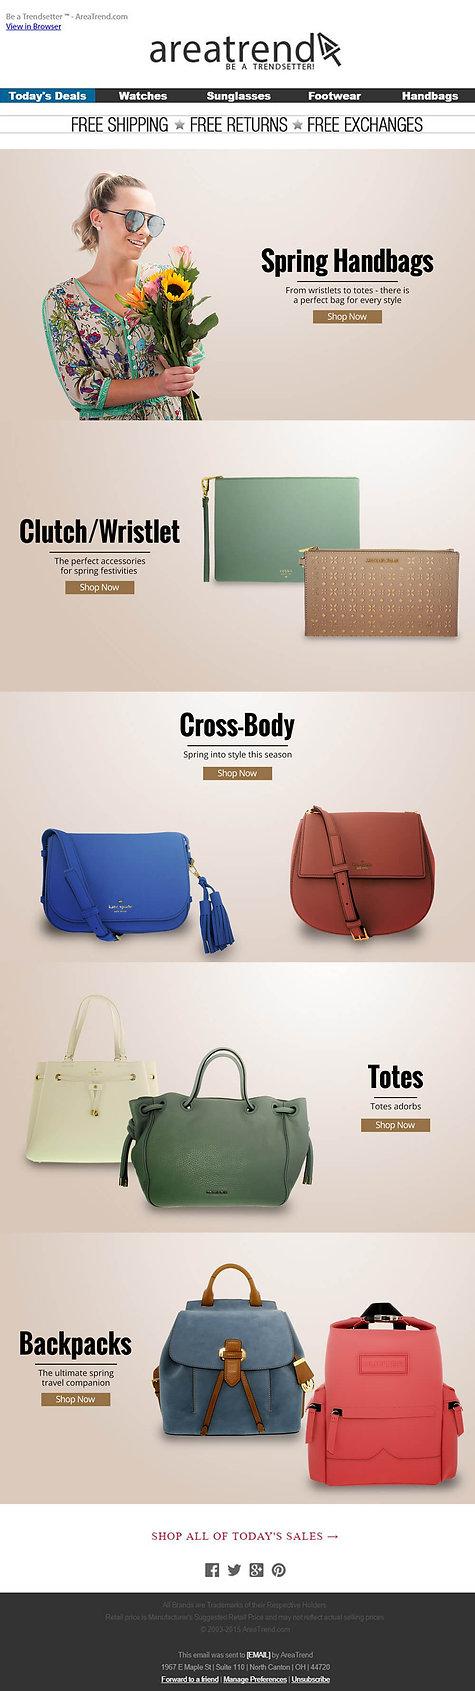 area trend handbag emailer